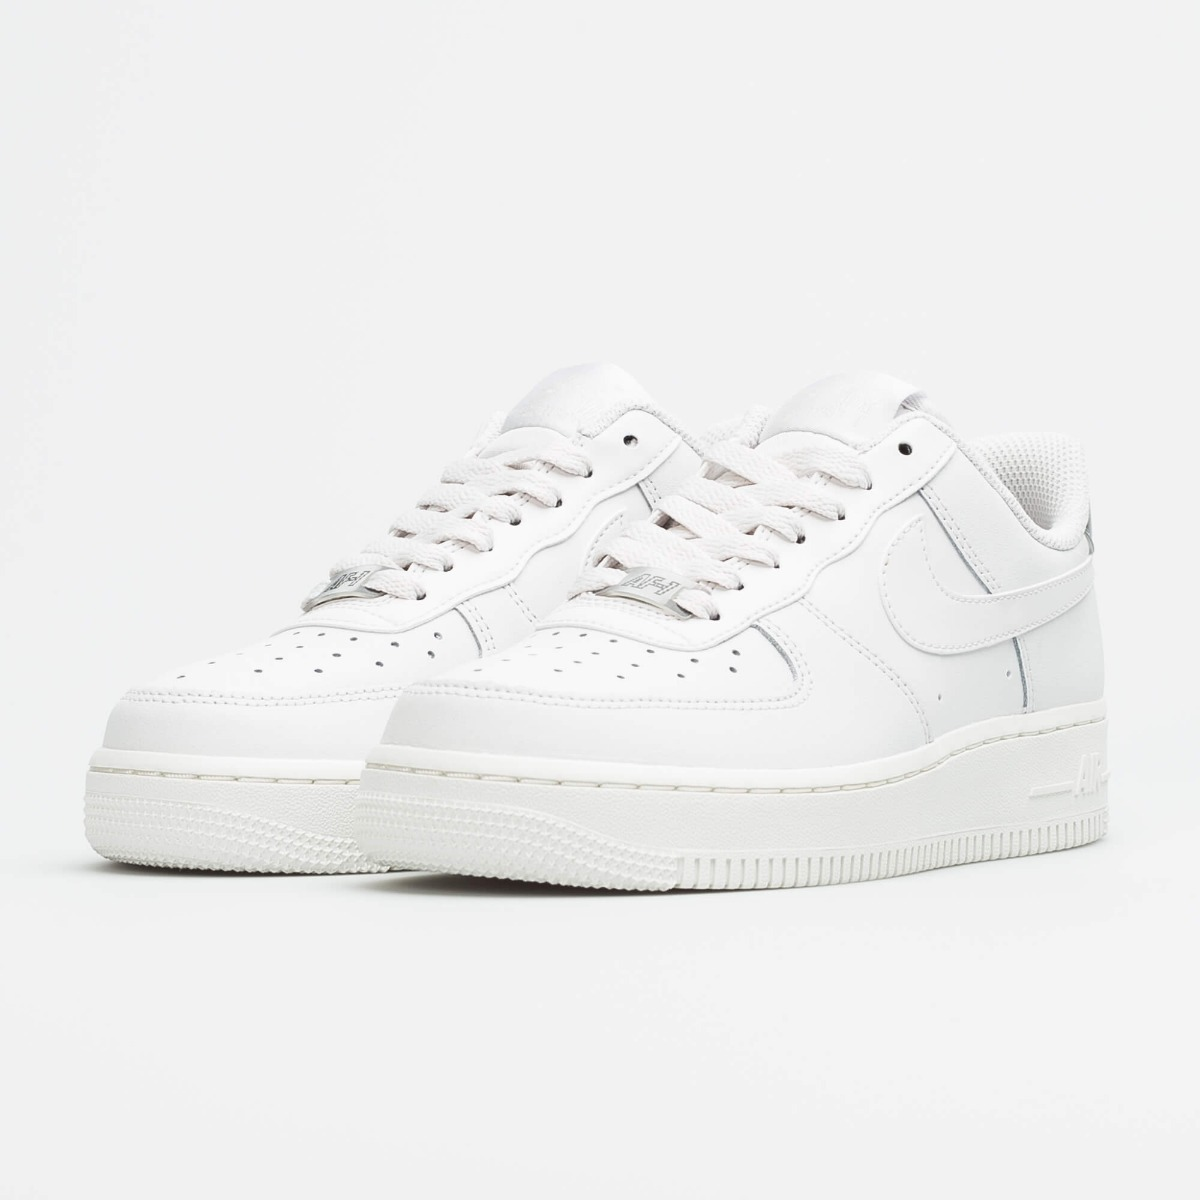 Tenis Nike Air Force 1 W Branco Gelo Casual Feminino